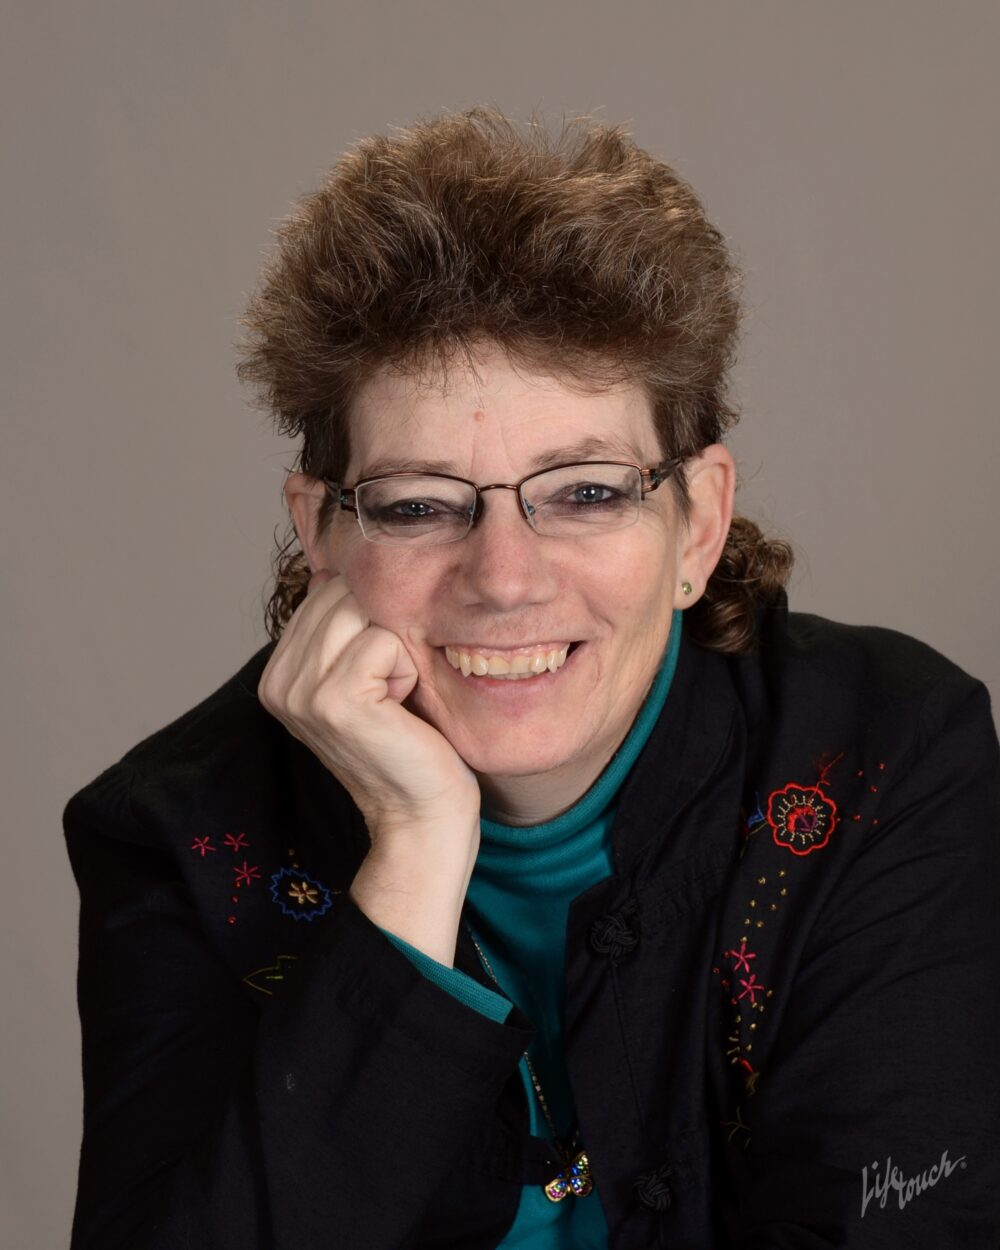 Don't Buy the Lie! – Sue Bowles